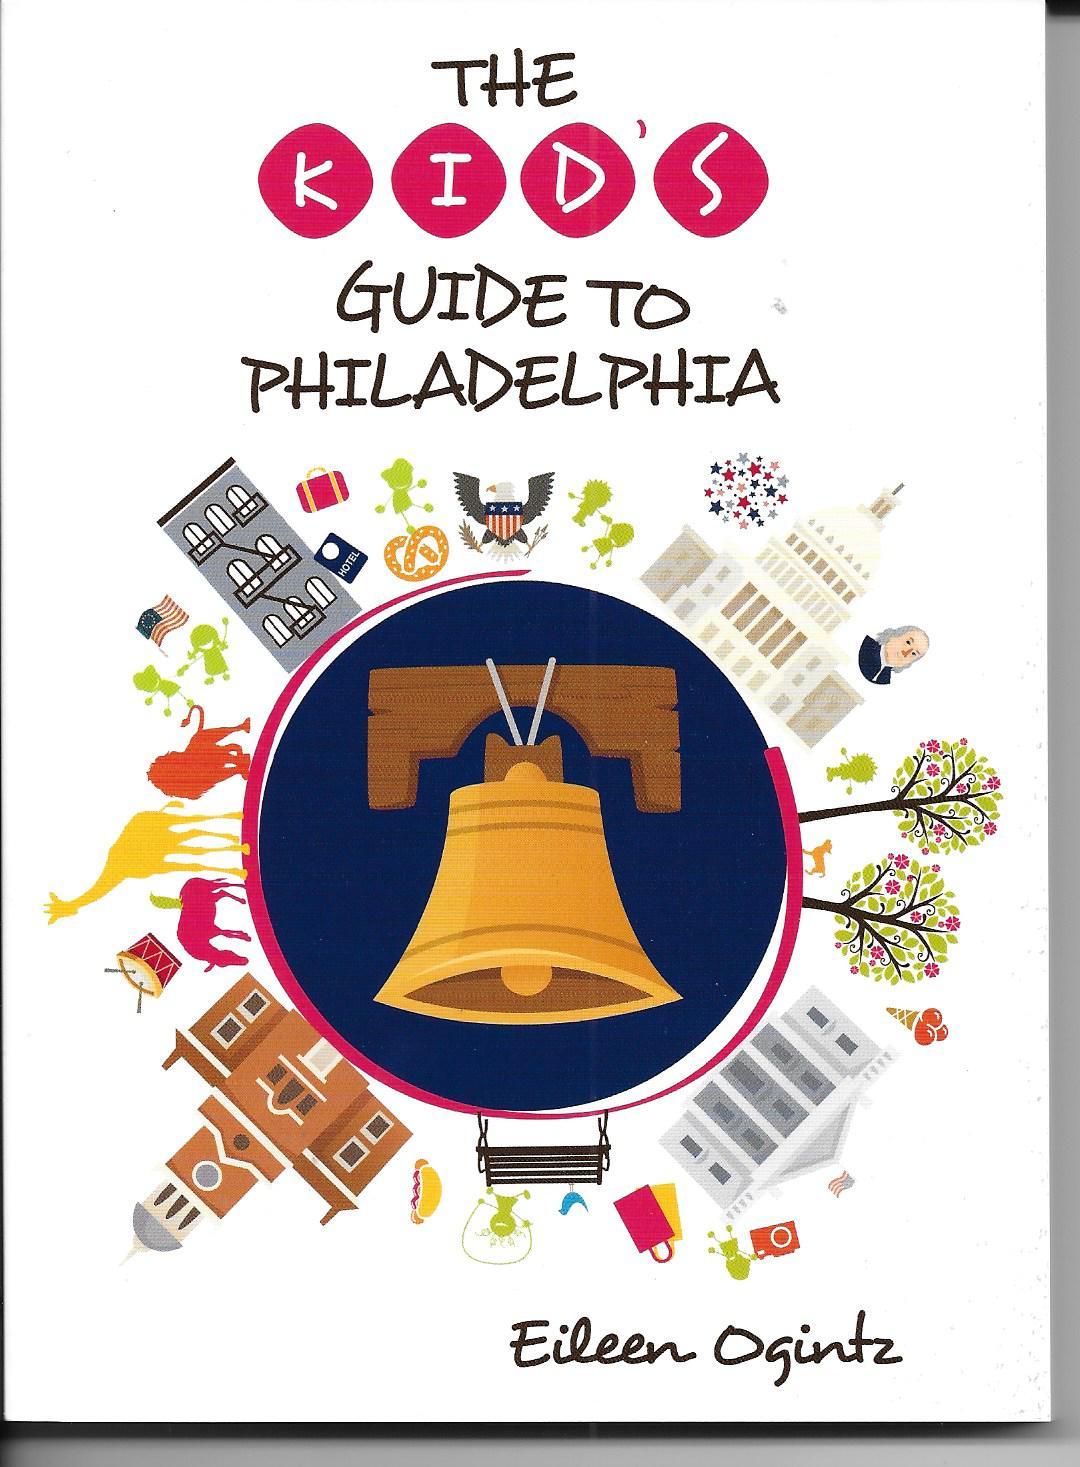 The Kids Guide to Philadelphia by Eileen Ogintz